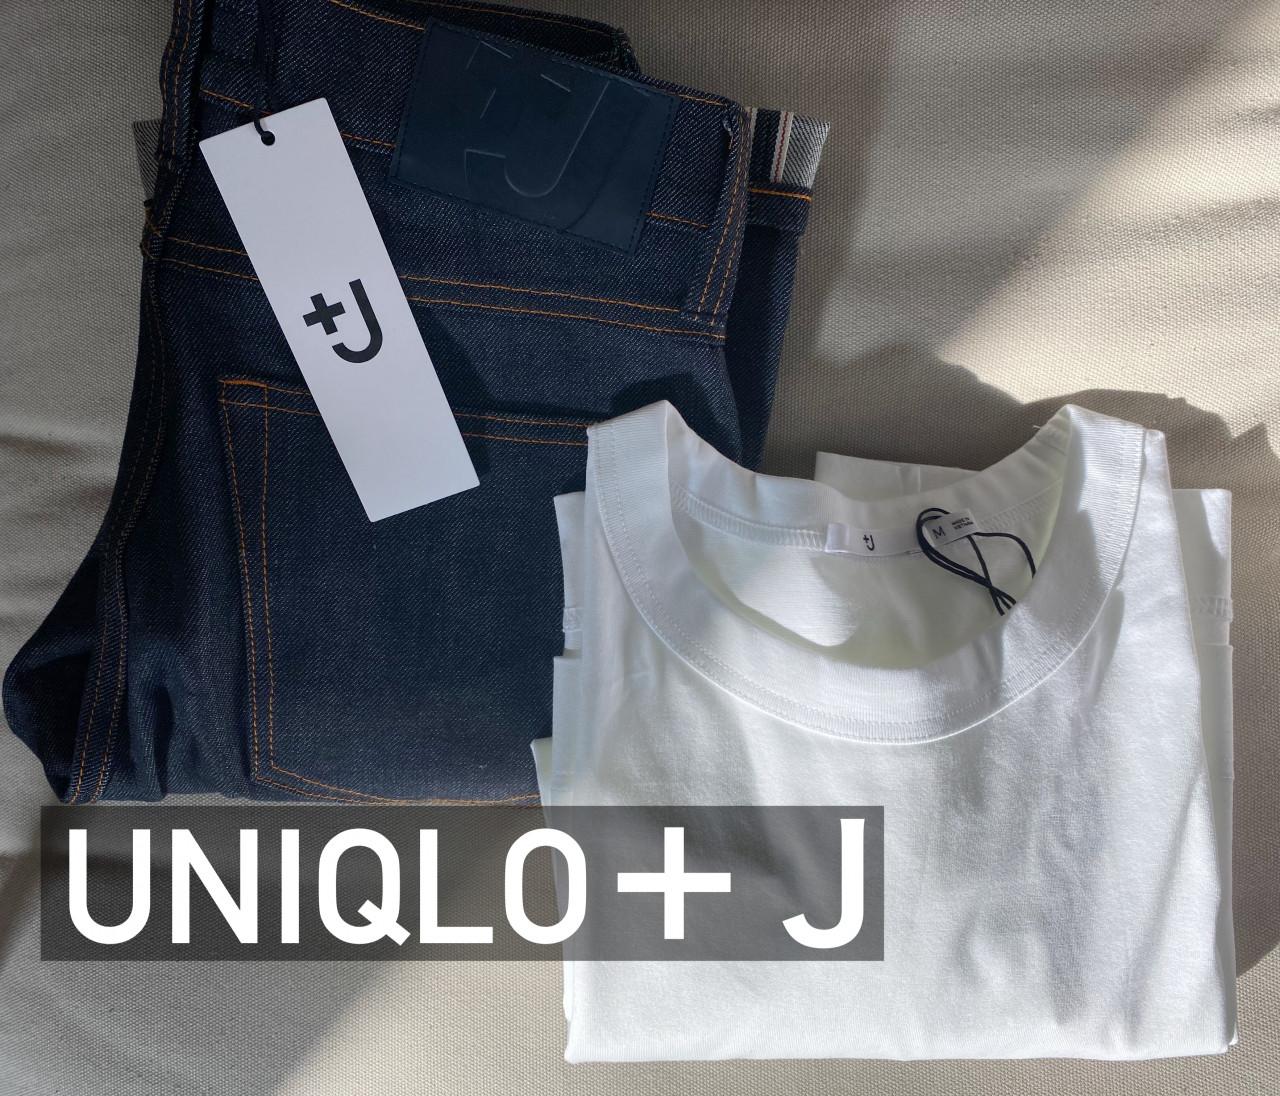 \UNIQLO+J/春夏コレクションをゲット!